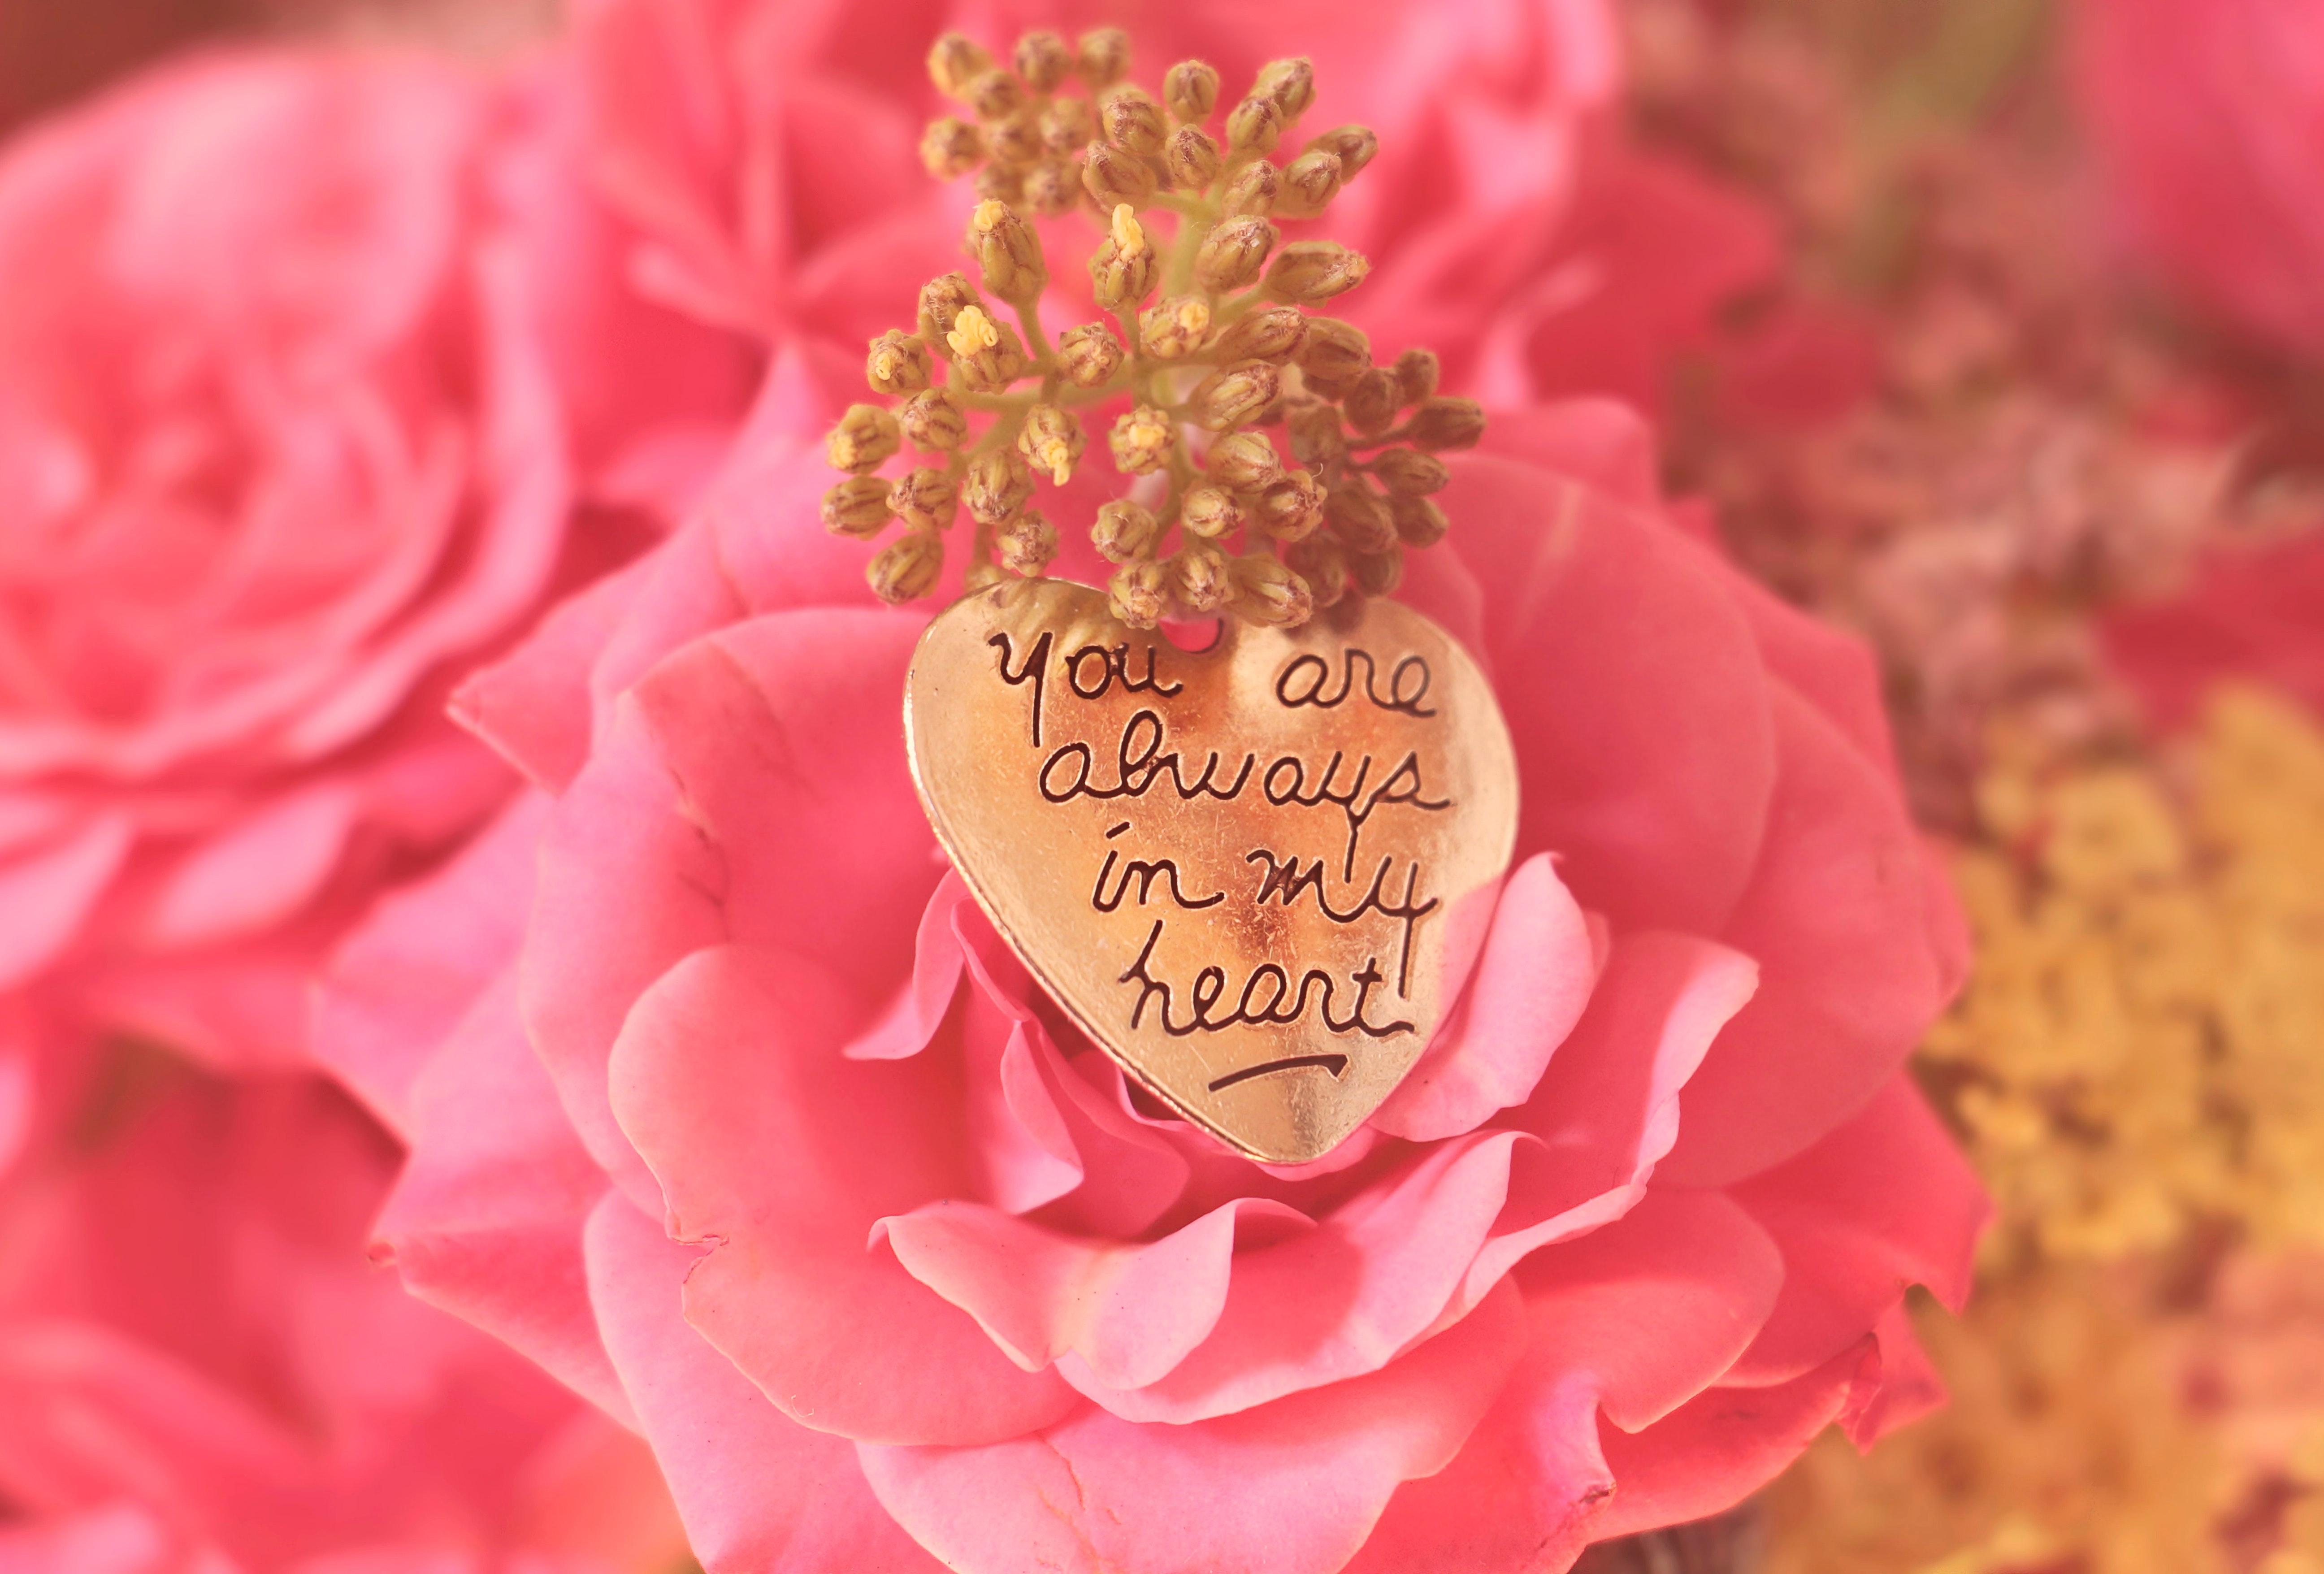 Free Images Petal Rose Family Garden Roses Floristry